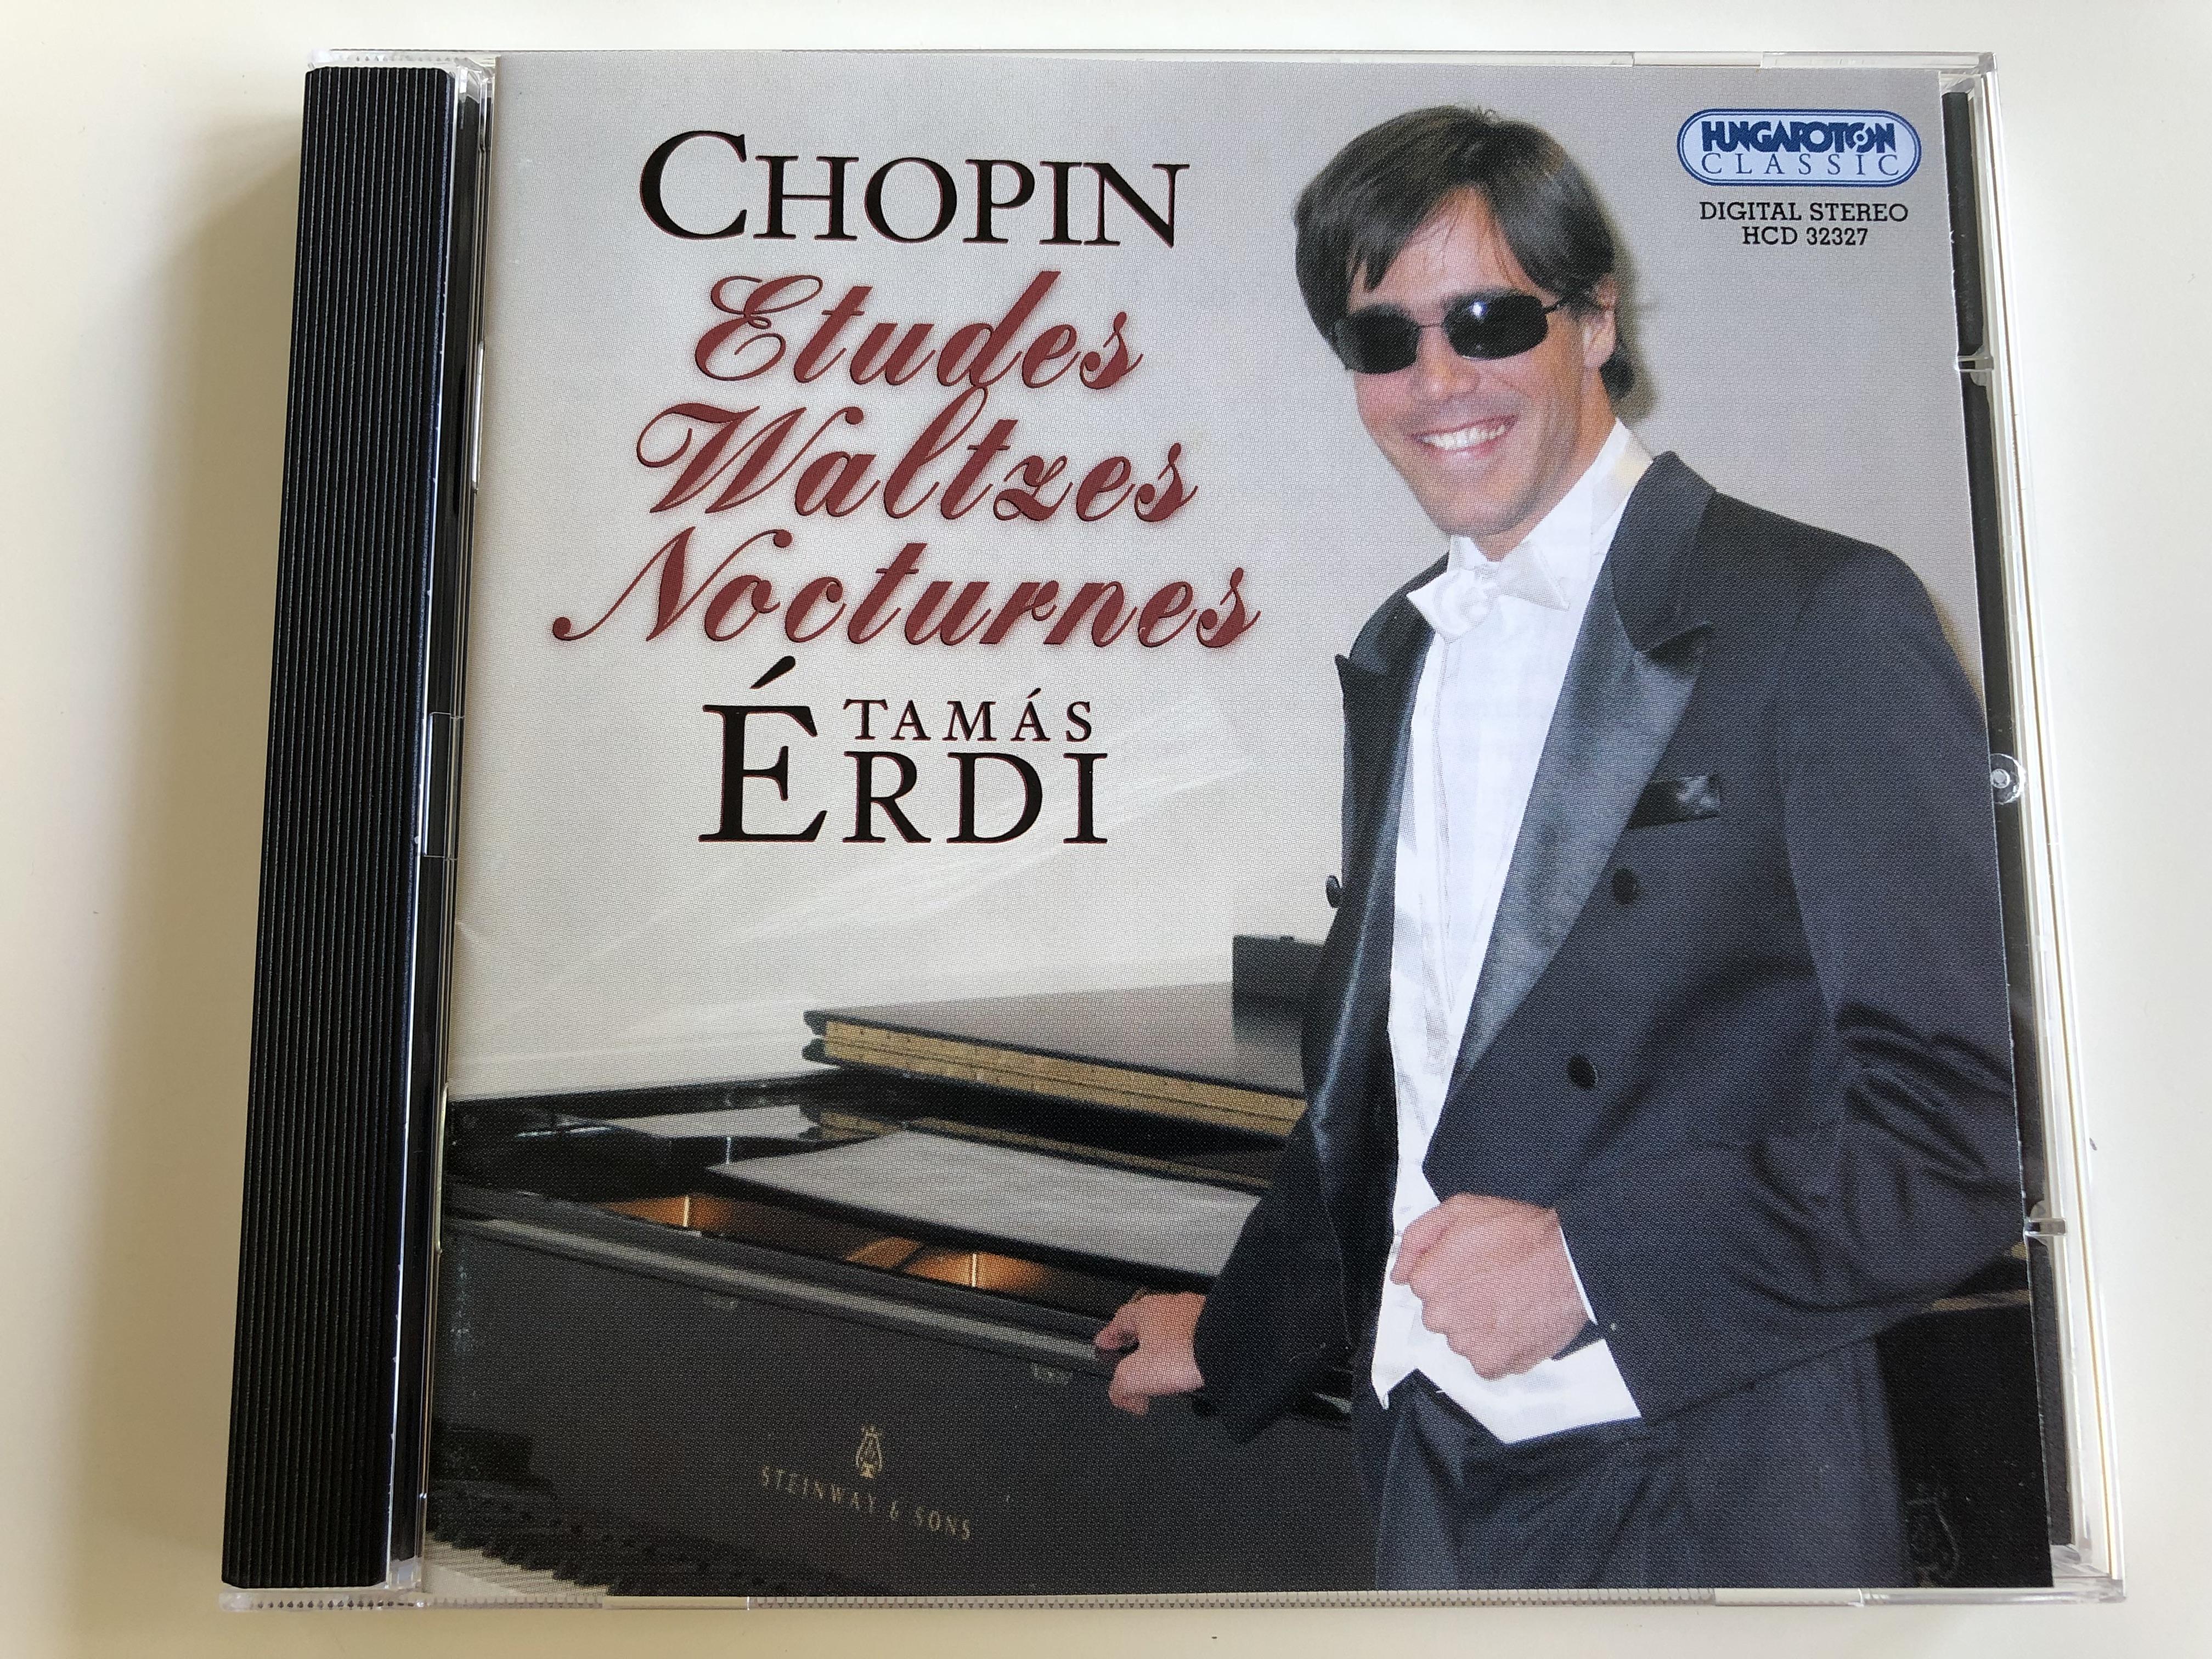 chopin-etudes-waltzes-nocturnes-tam-s-rdi-piano-hungaroton-classic-audio-cd-2004-hcd-32327-1-.jpg